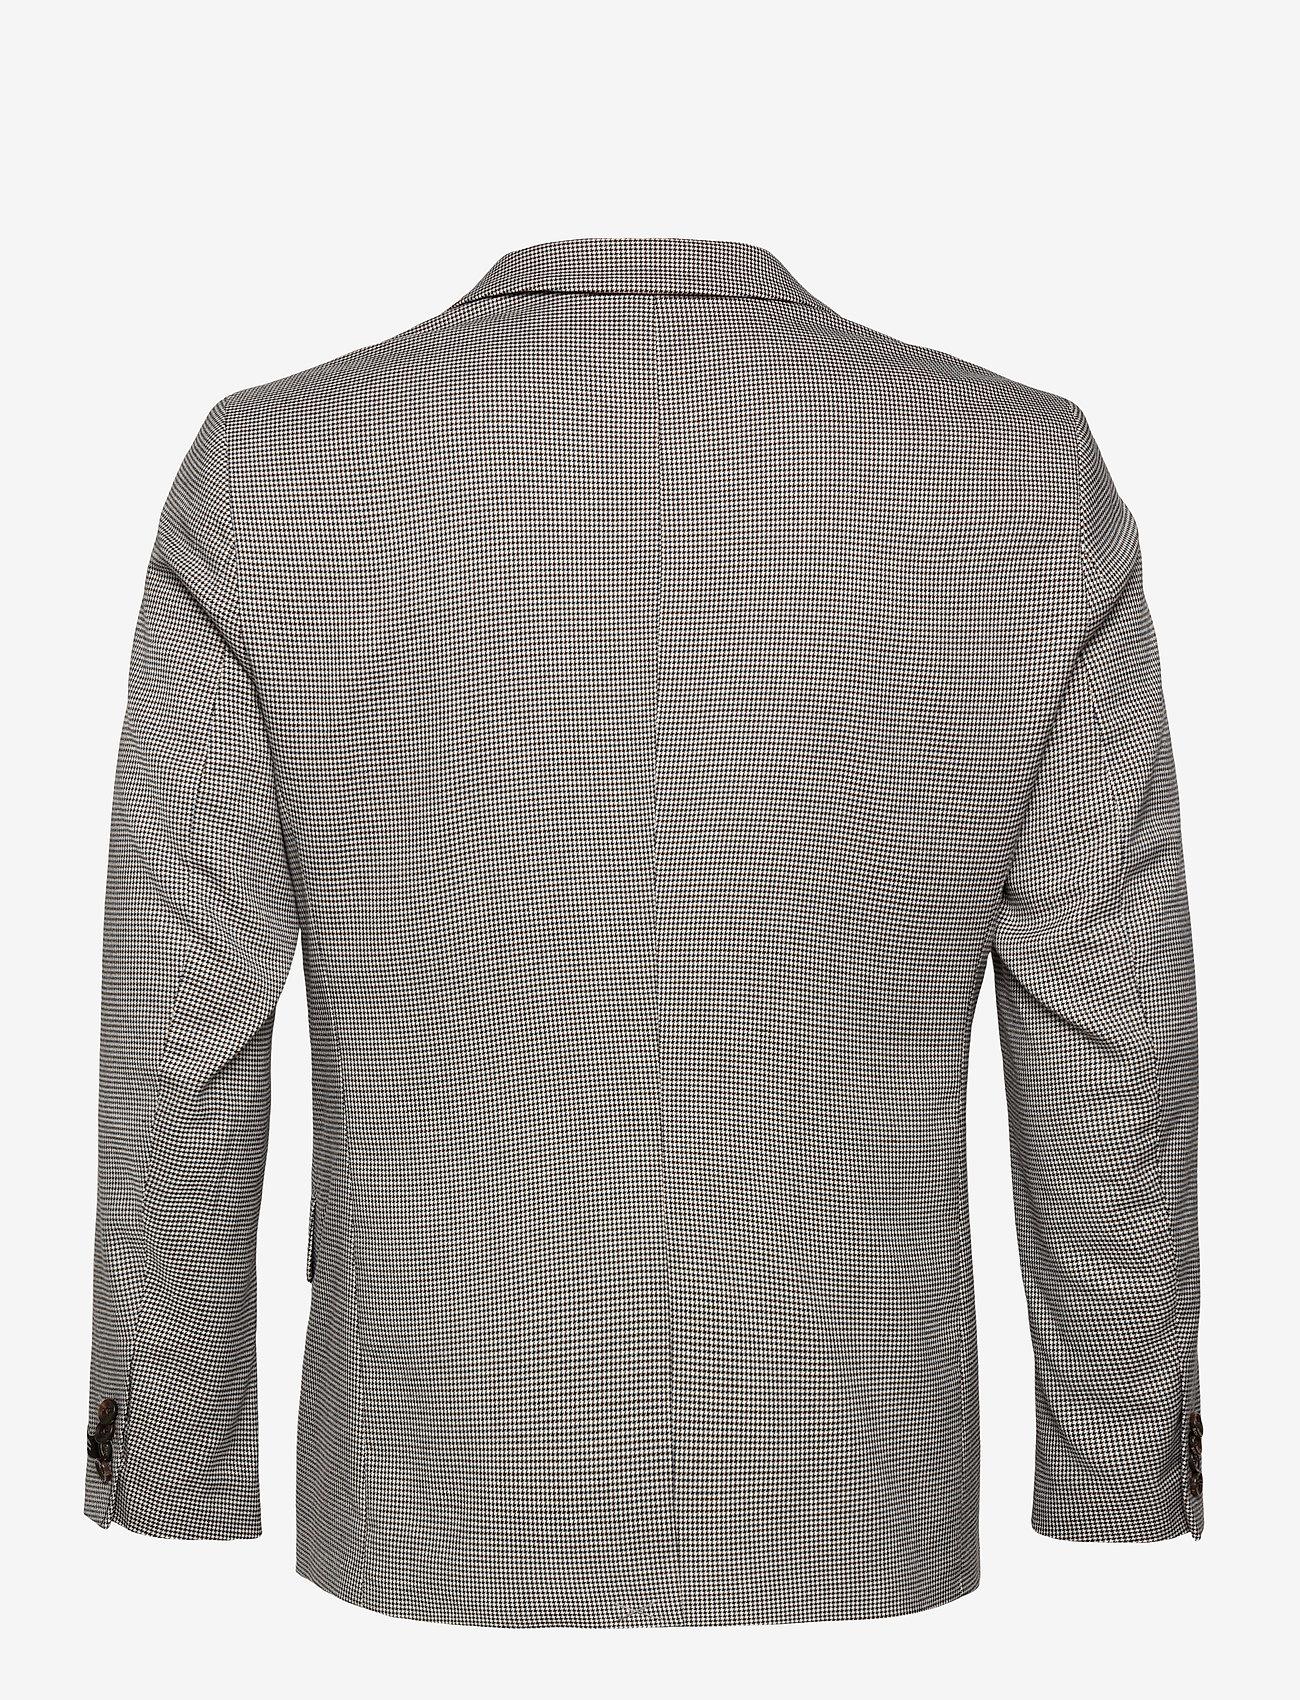 Scotch & Soda - Classic single breasted blazer in yarn-dyed pattern - blazers à boutonnage simple - combo f - 1